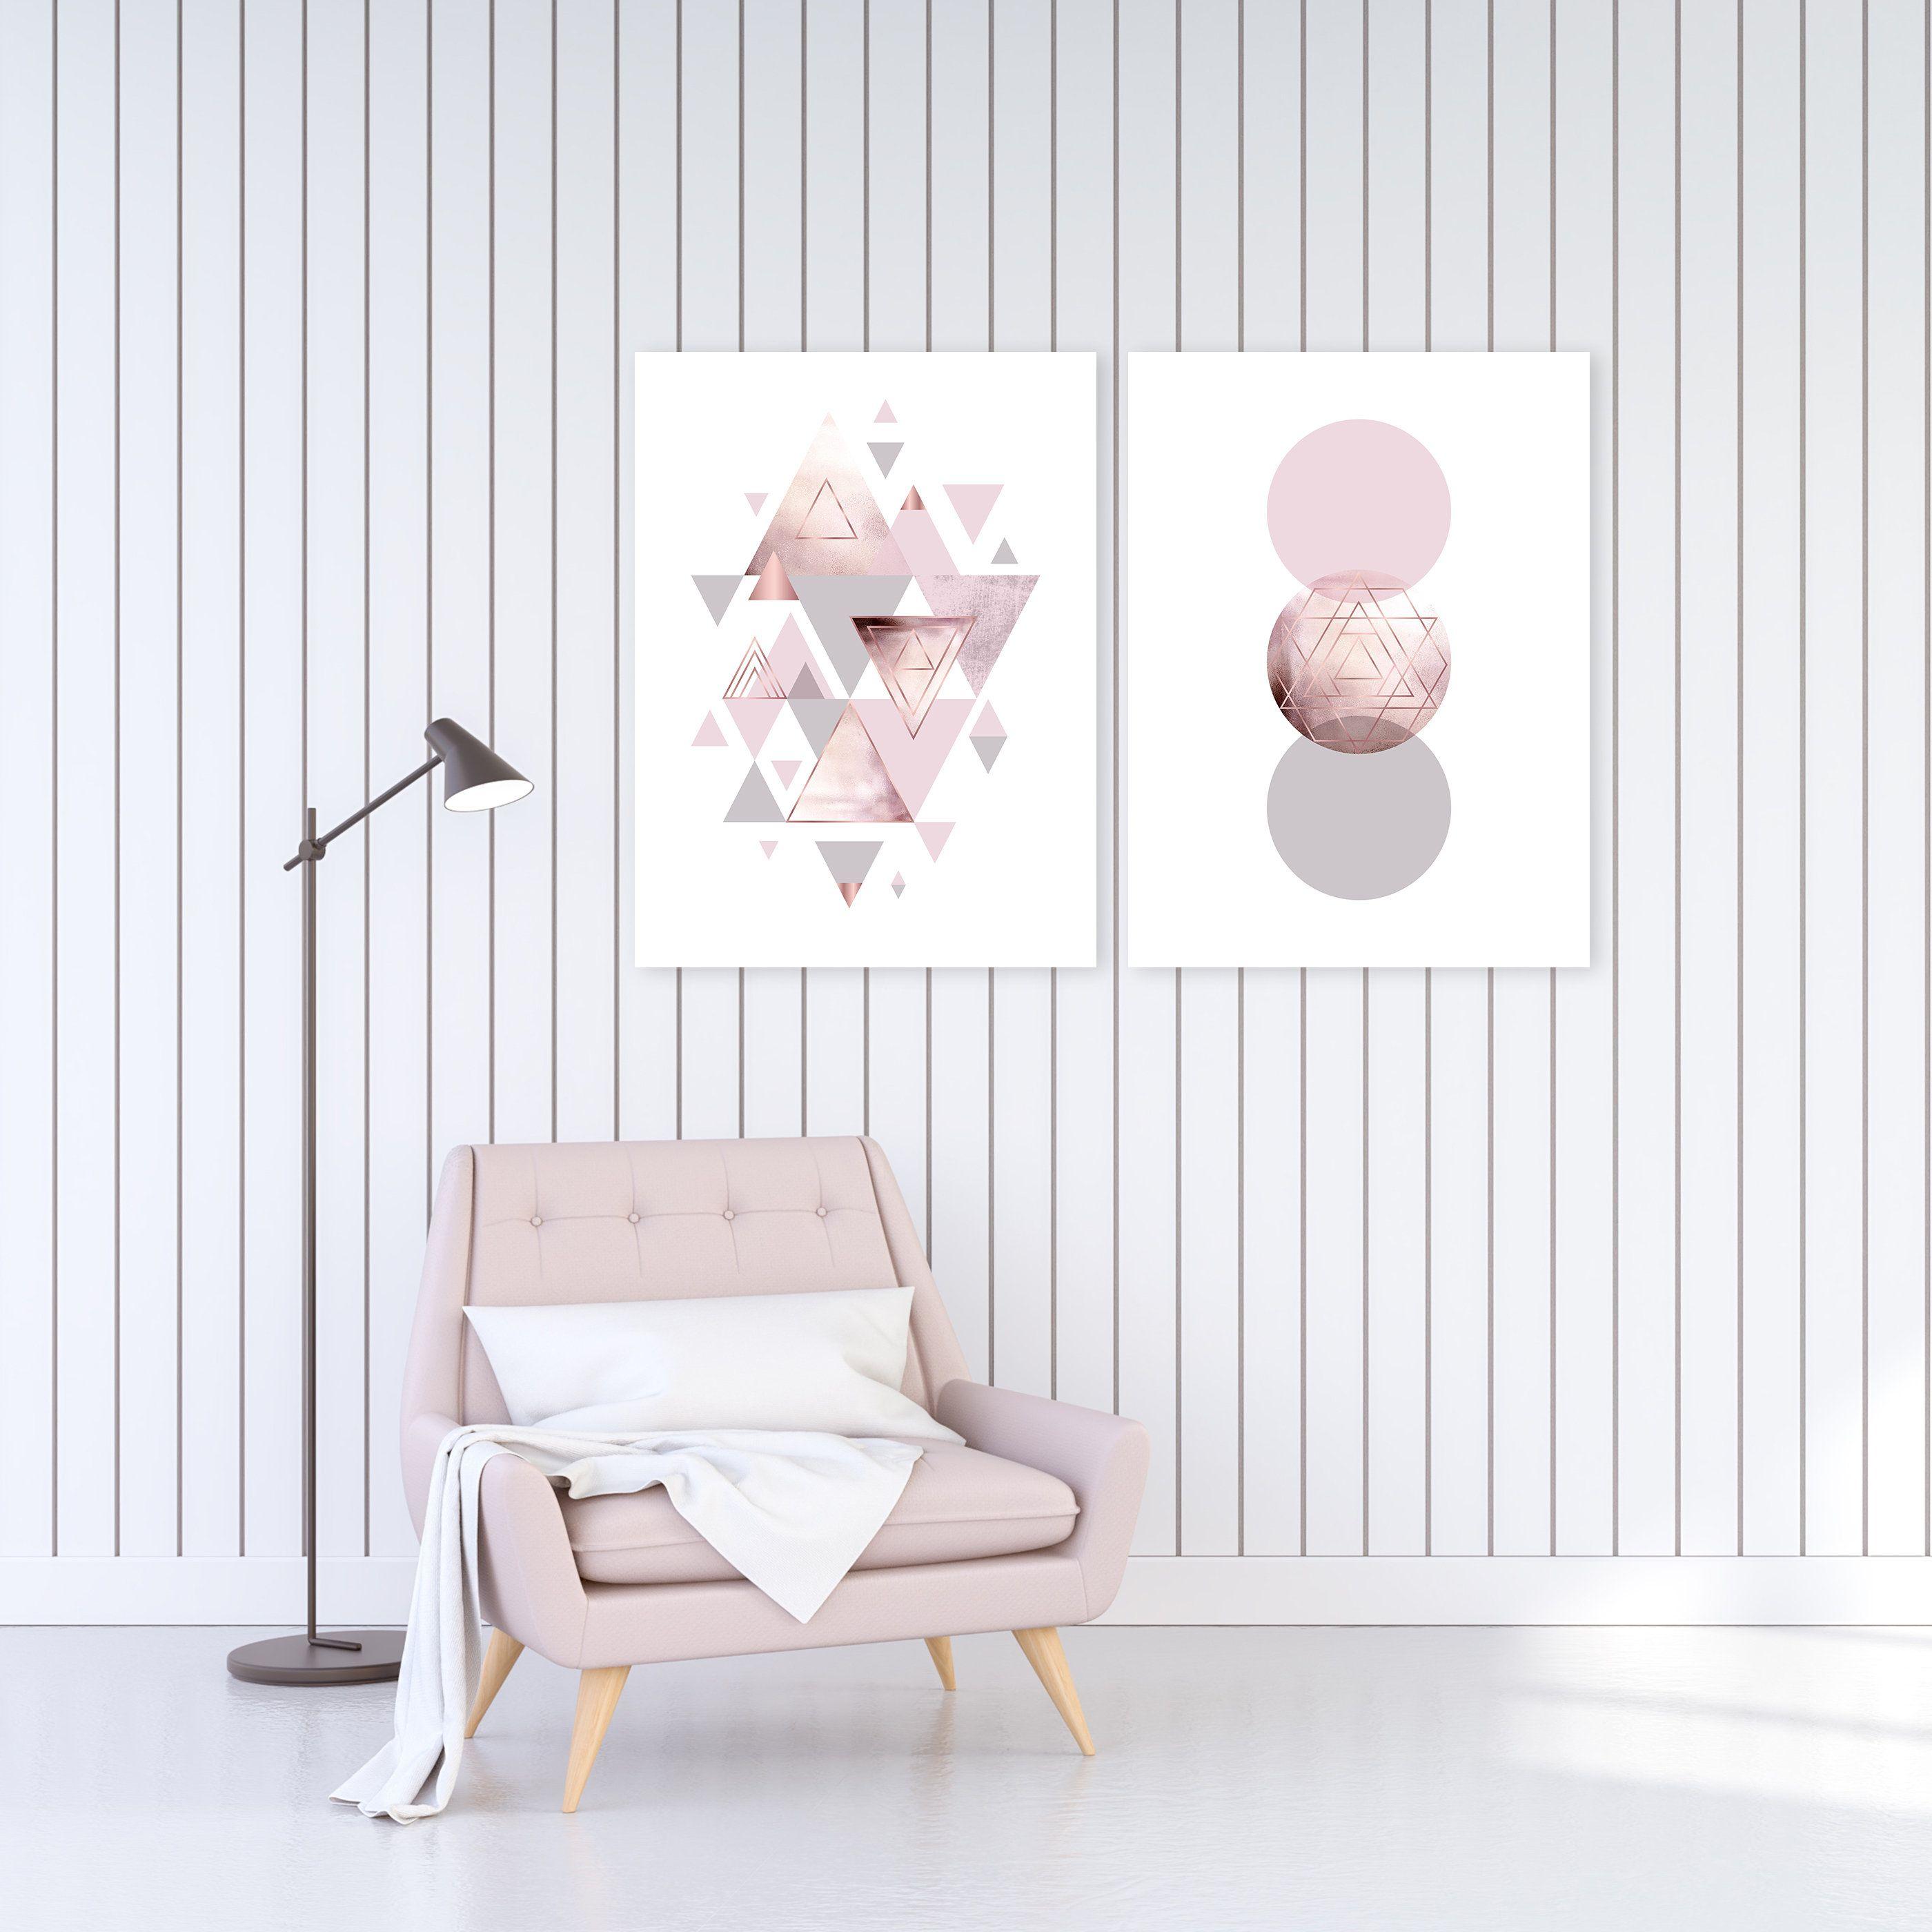 Dandelion Wall Art Decor Dandelion Blush Pink Grey Etsy Dandelion Wall Art Grey Wall Art Pink Wall Art